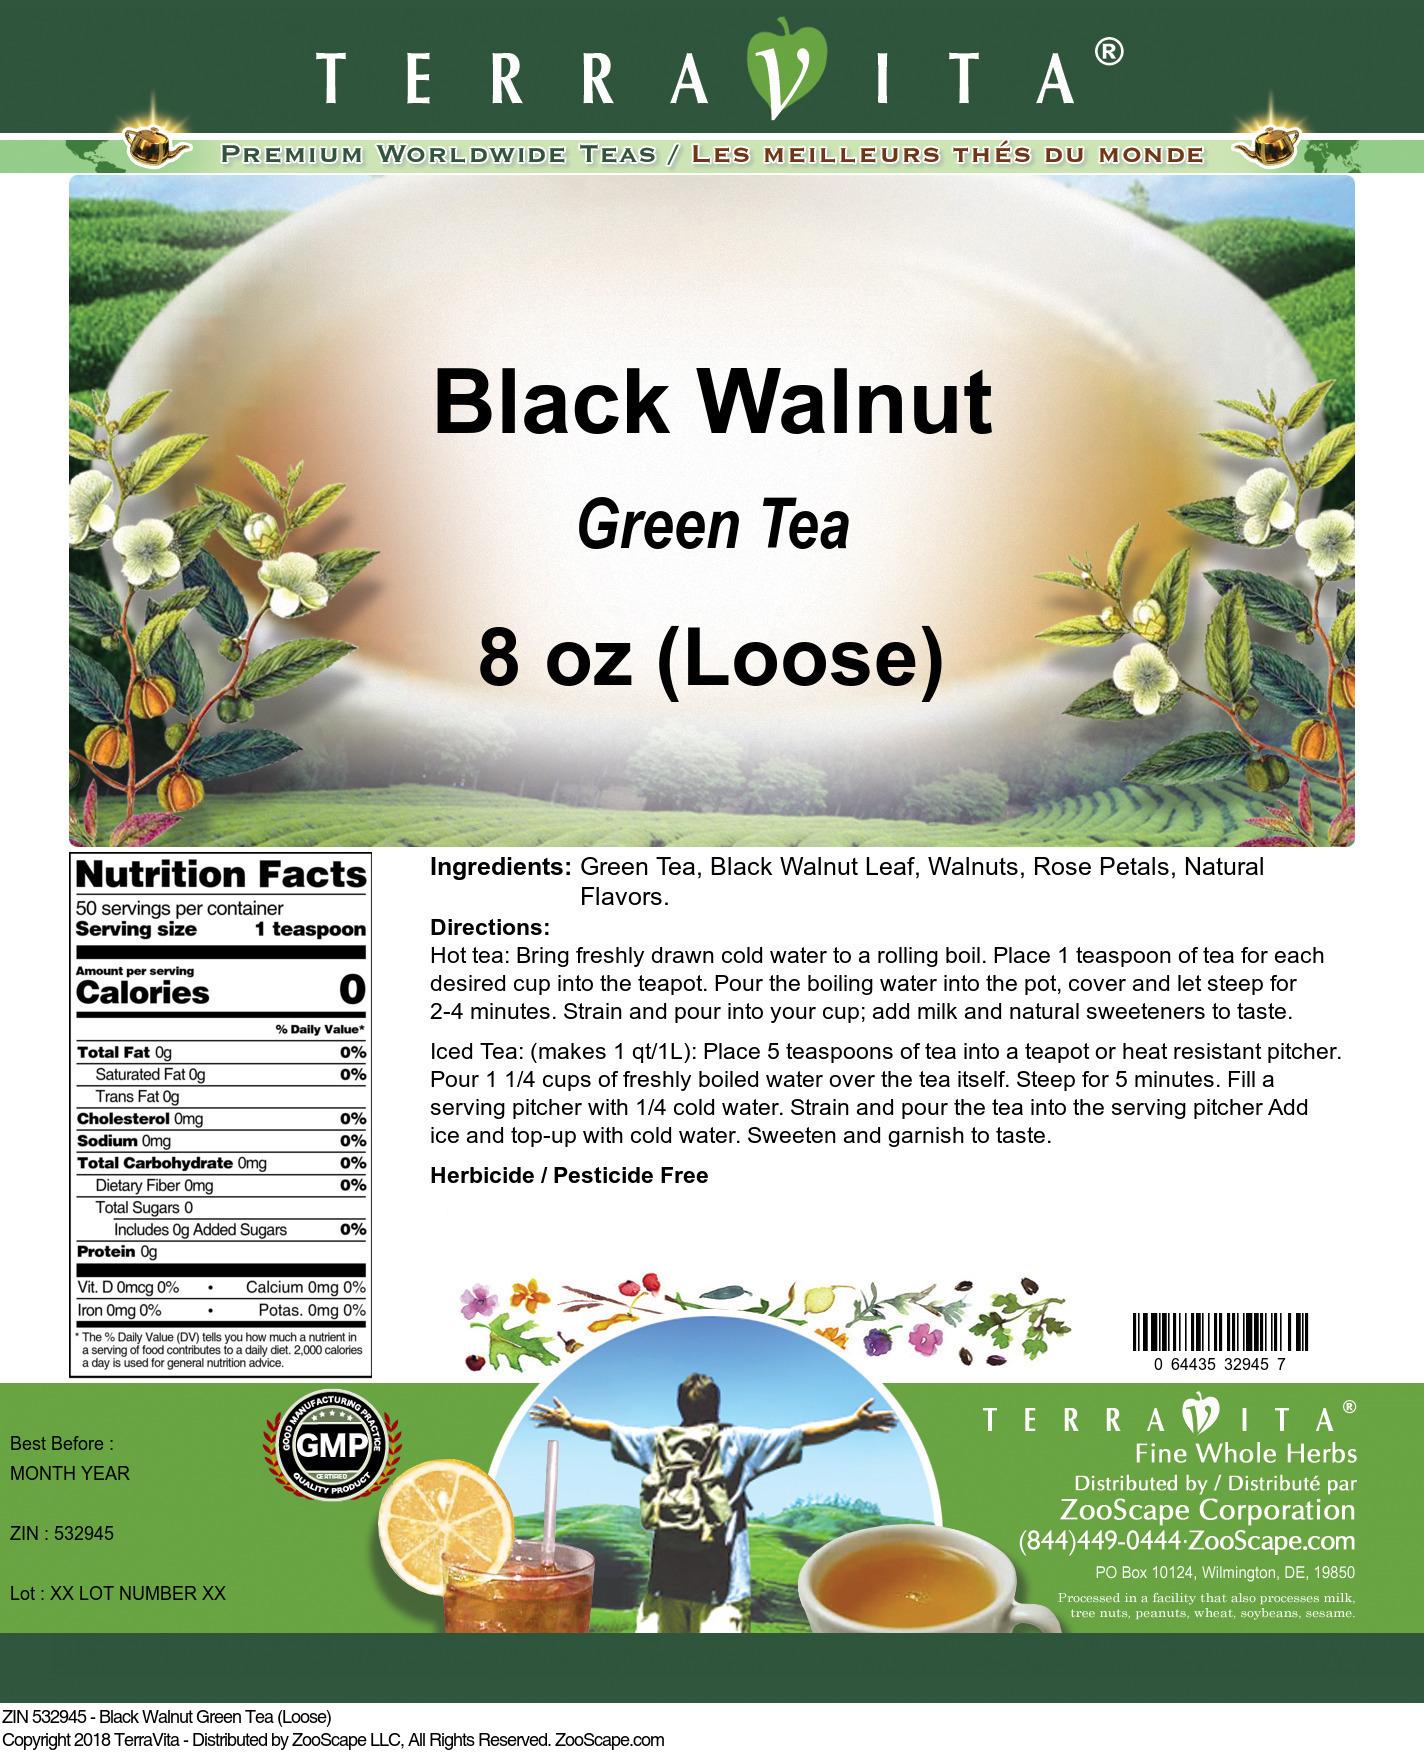 Black Walnut Green Tea (Loose)